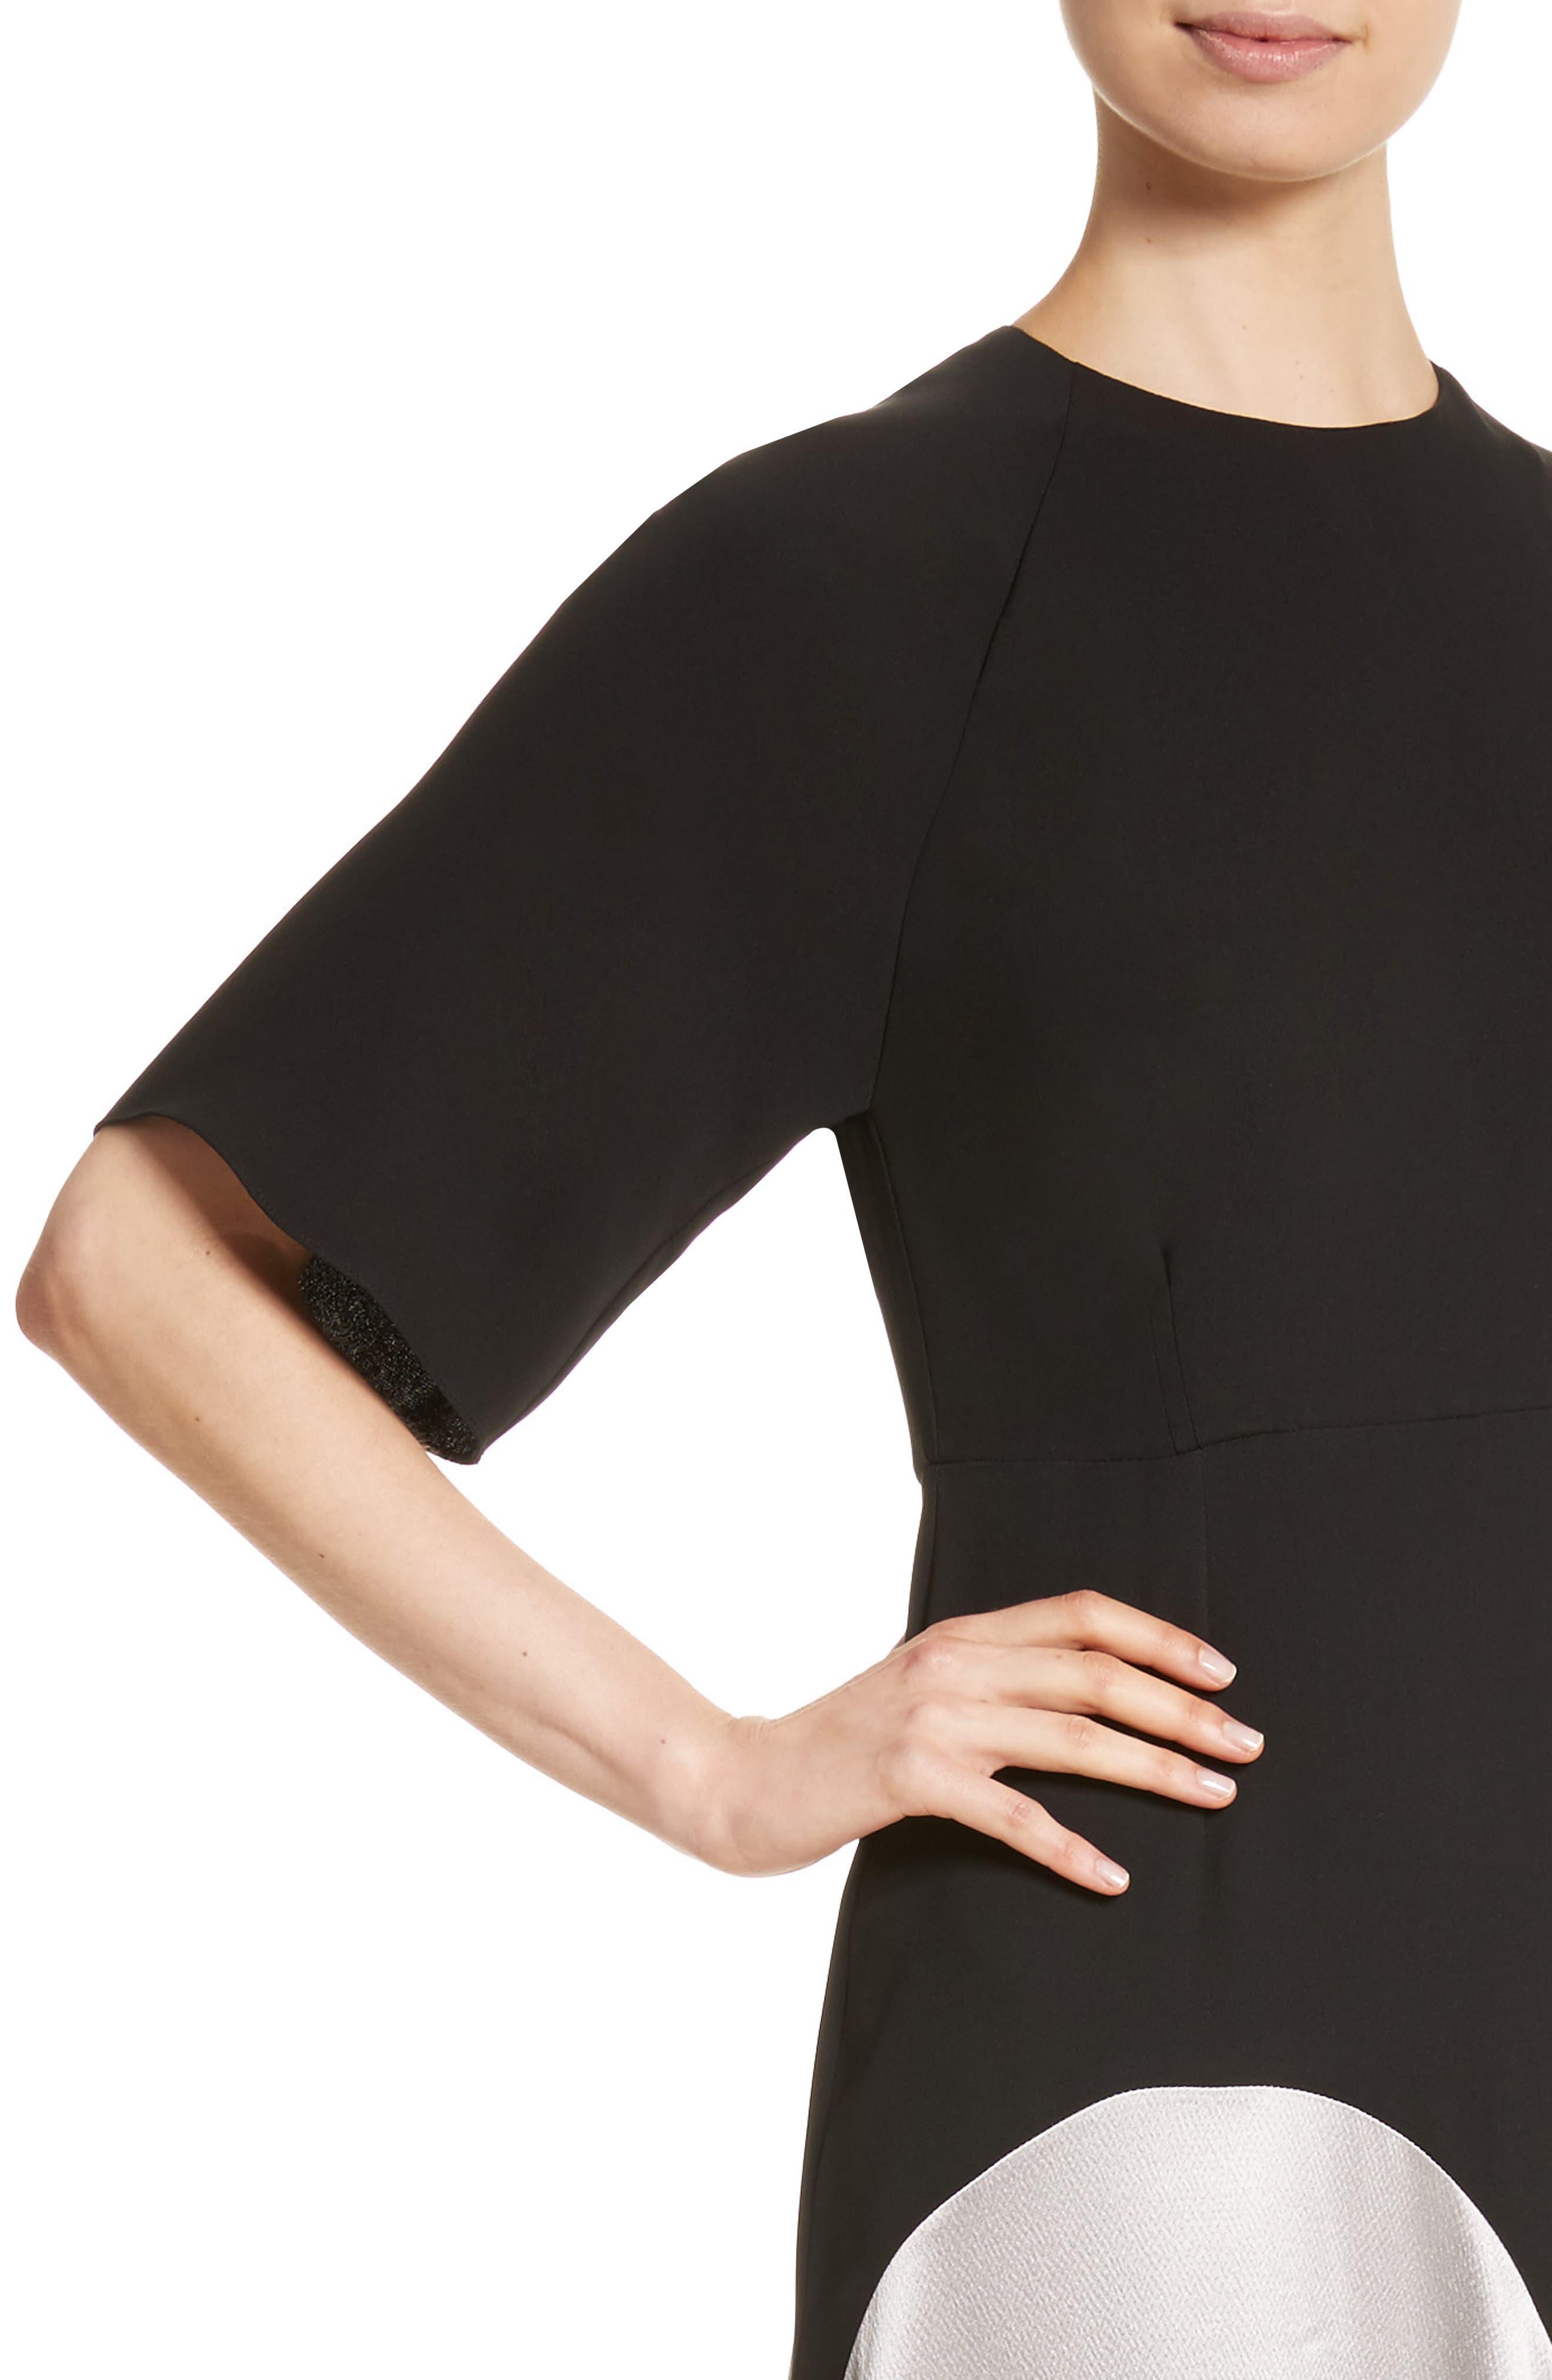 Rauma Silk Dress,                             Alternate thumbnail 4, color,                             Black/ Silver/ Sand/ Ivory